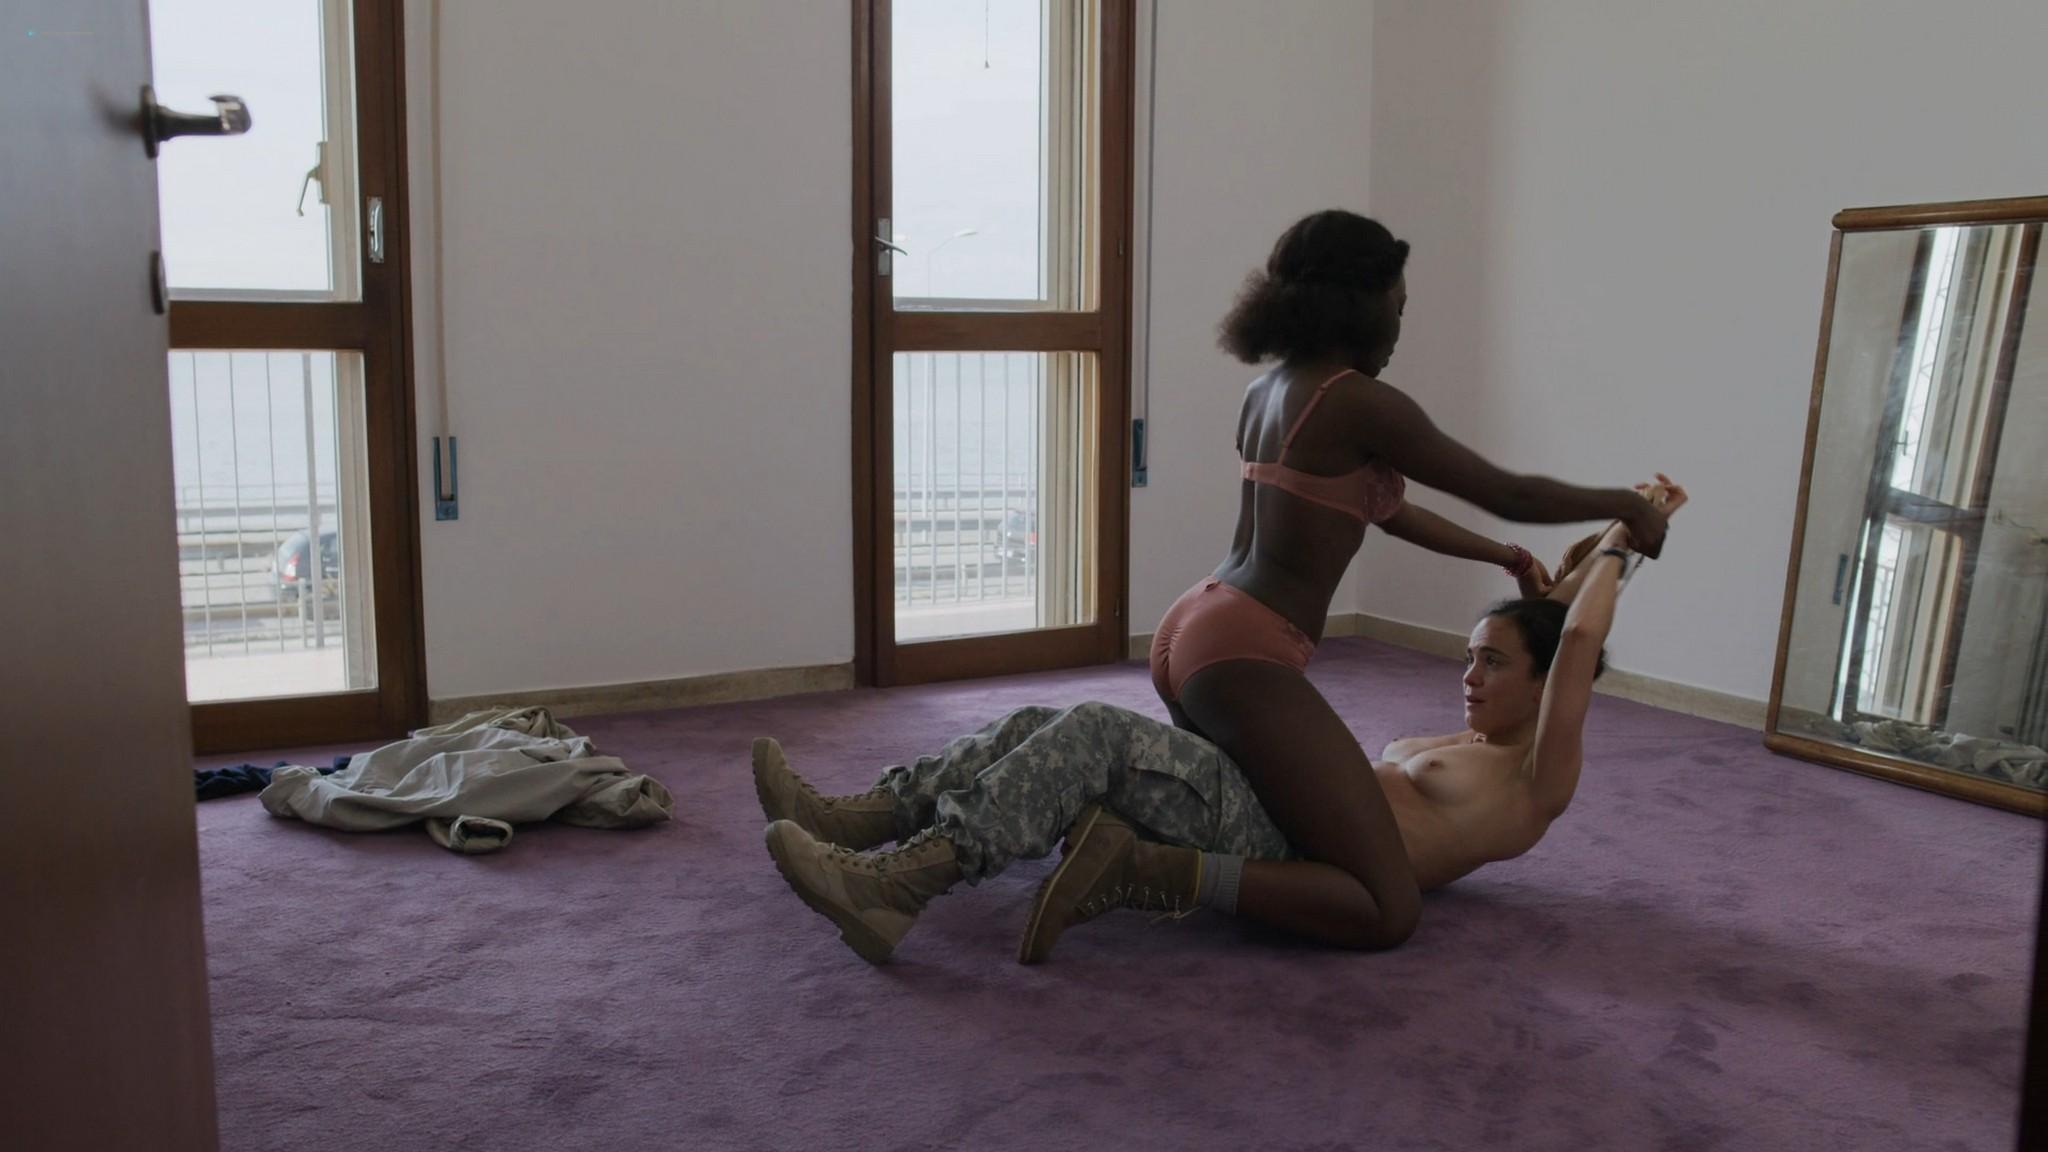 Alice Braga nude lesbian sex with Faith Alabi Chloe Sevigny sexy We Are Who We Are 2020 s1e5 HD 1080p 004